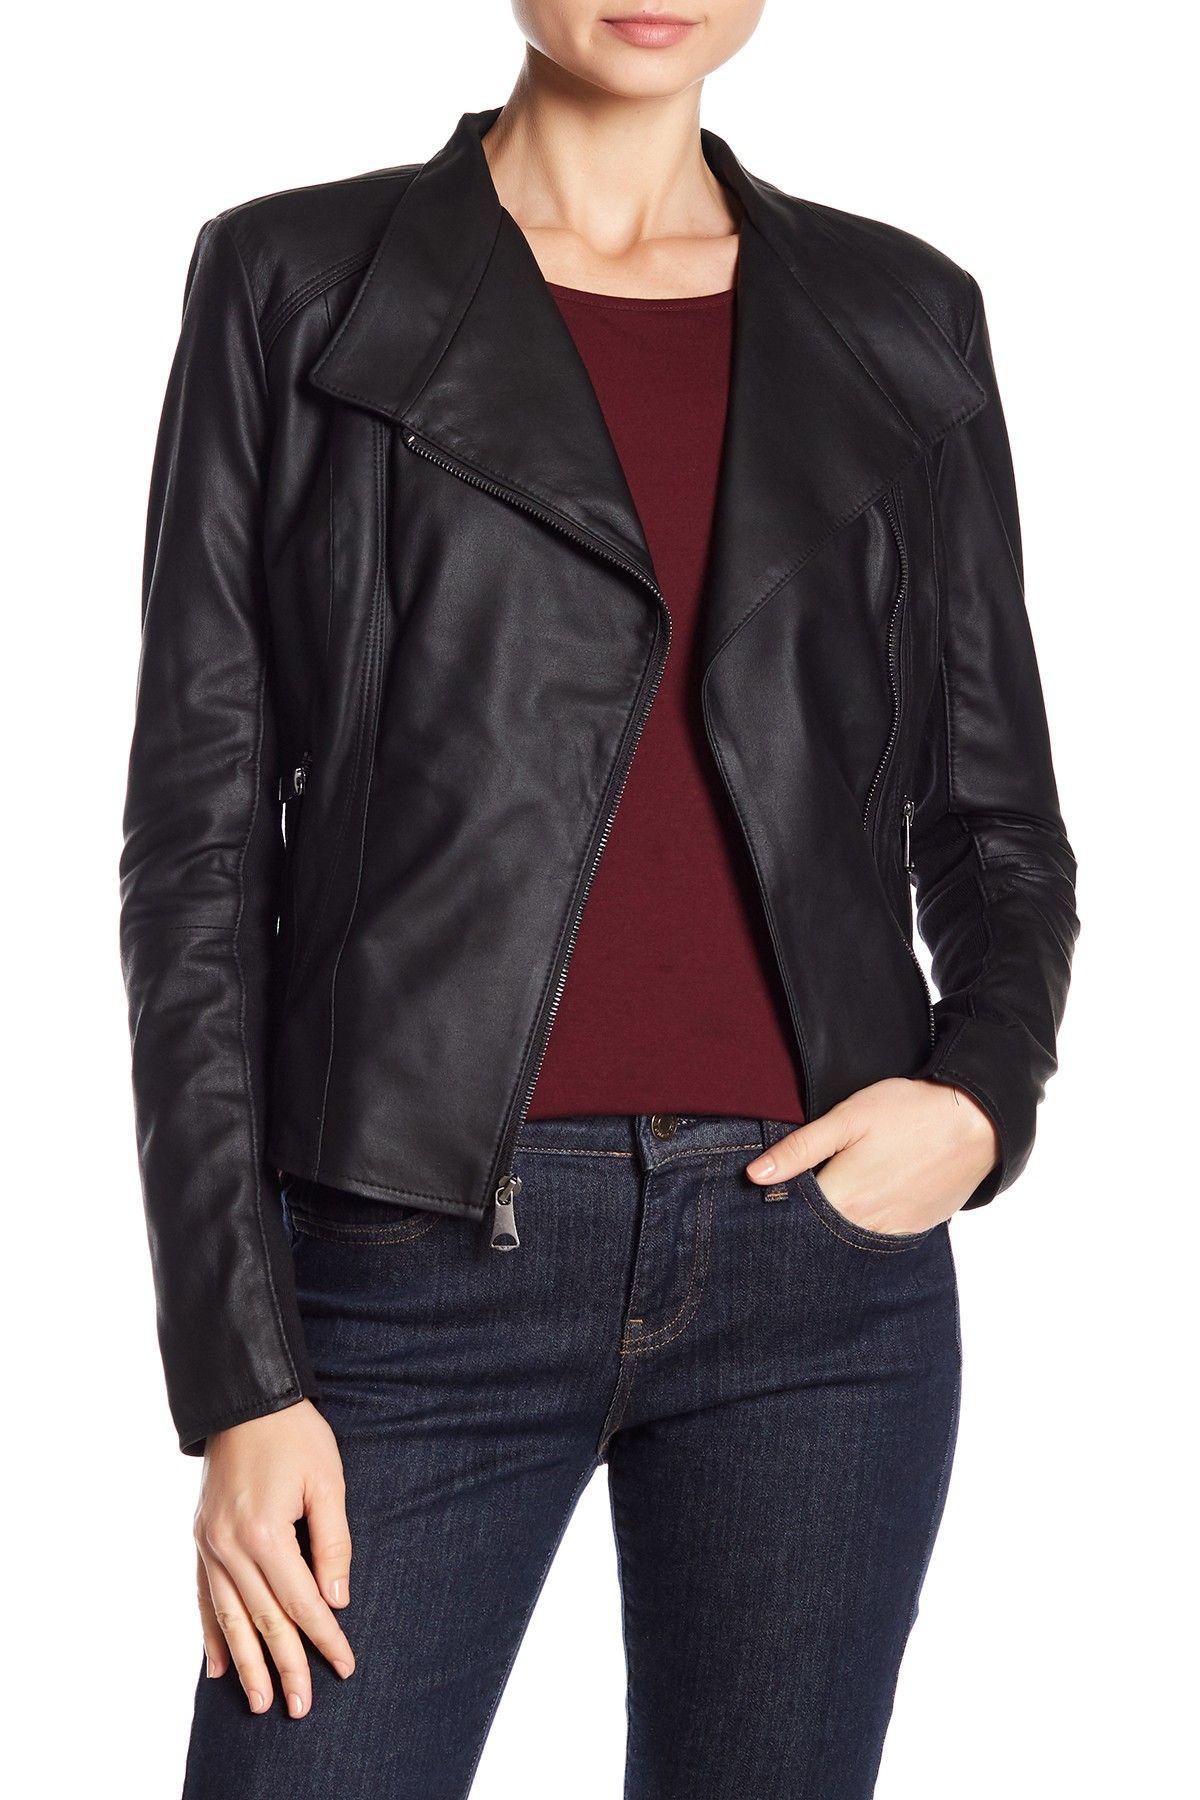 Marc New York Felix Leather Jacket (With images